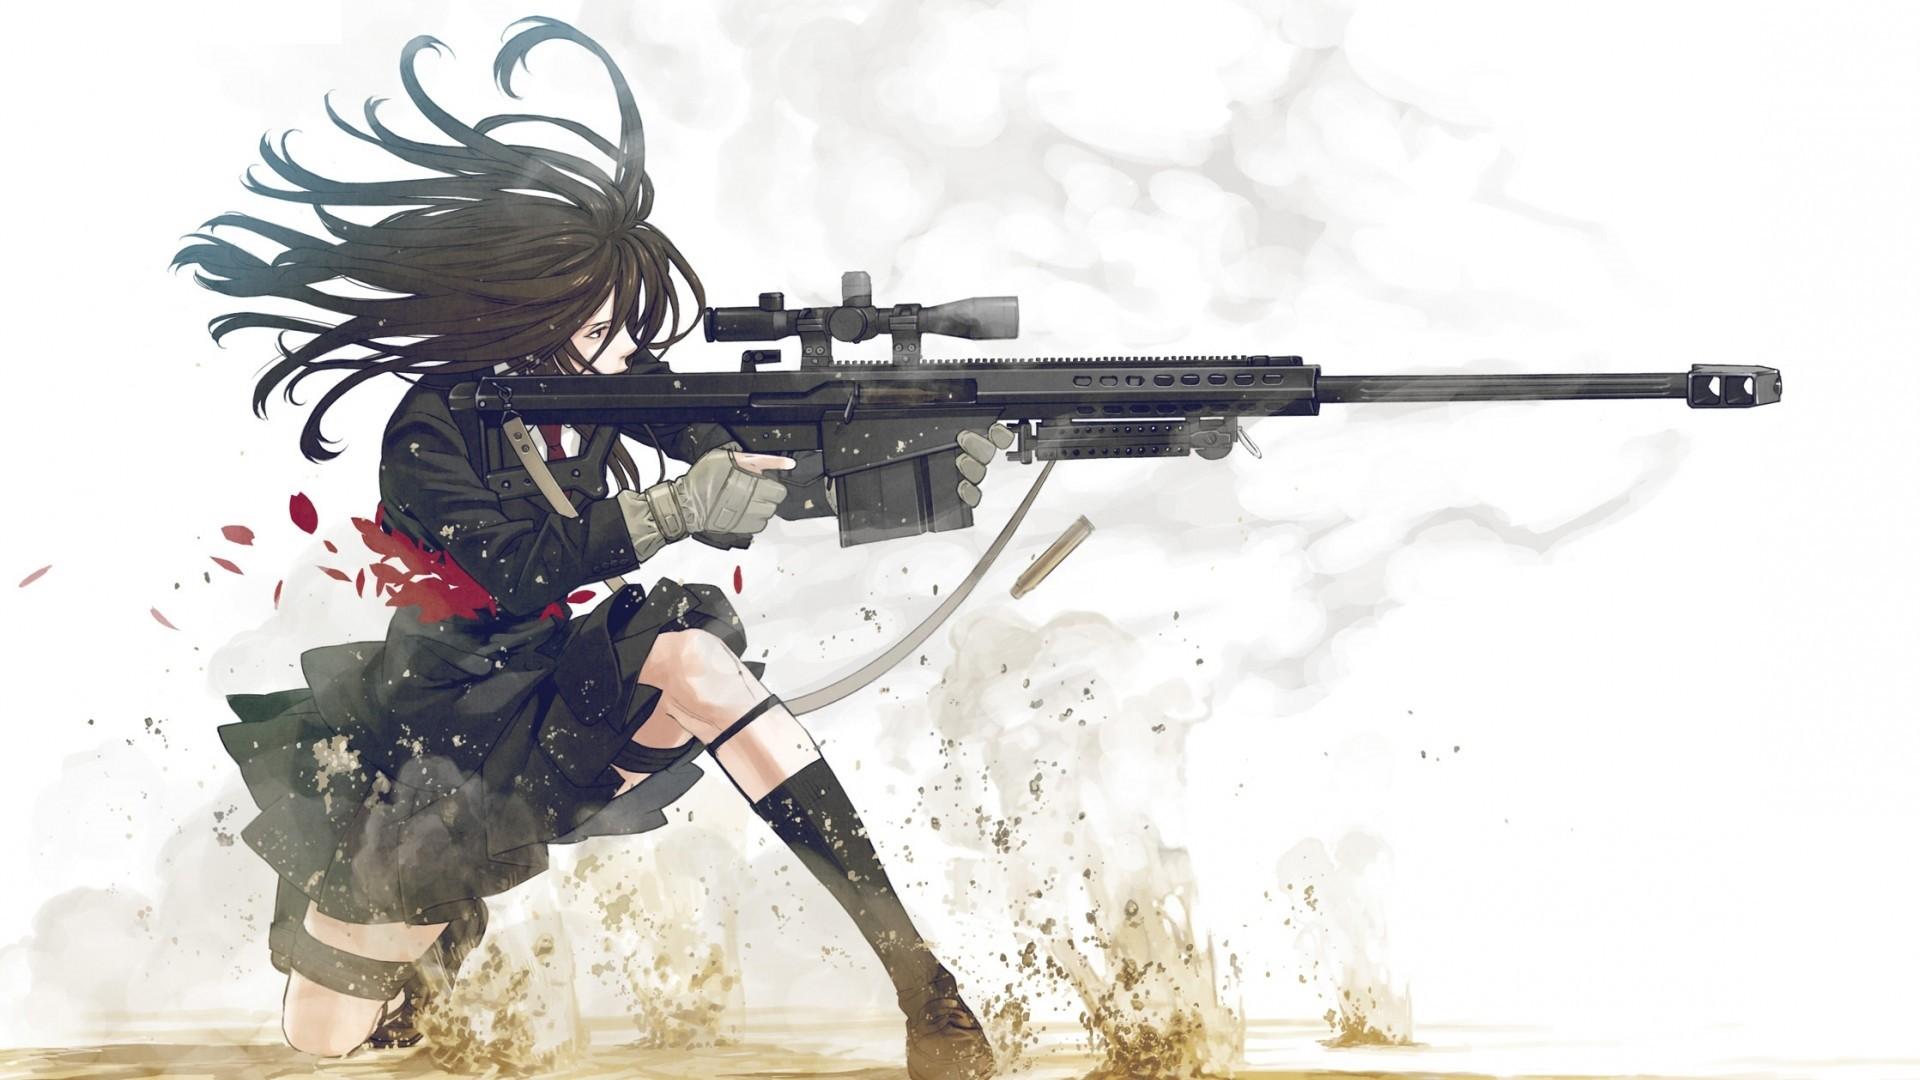 Anime Girls With Guns Wallpaper Image